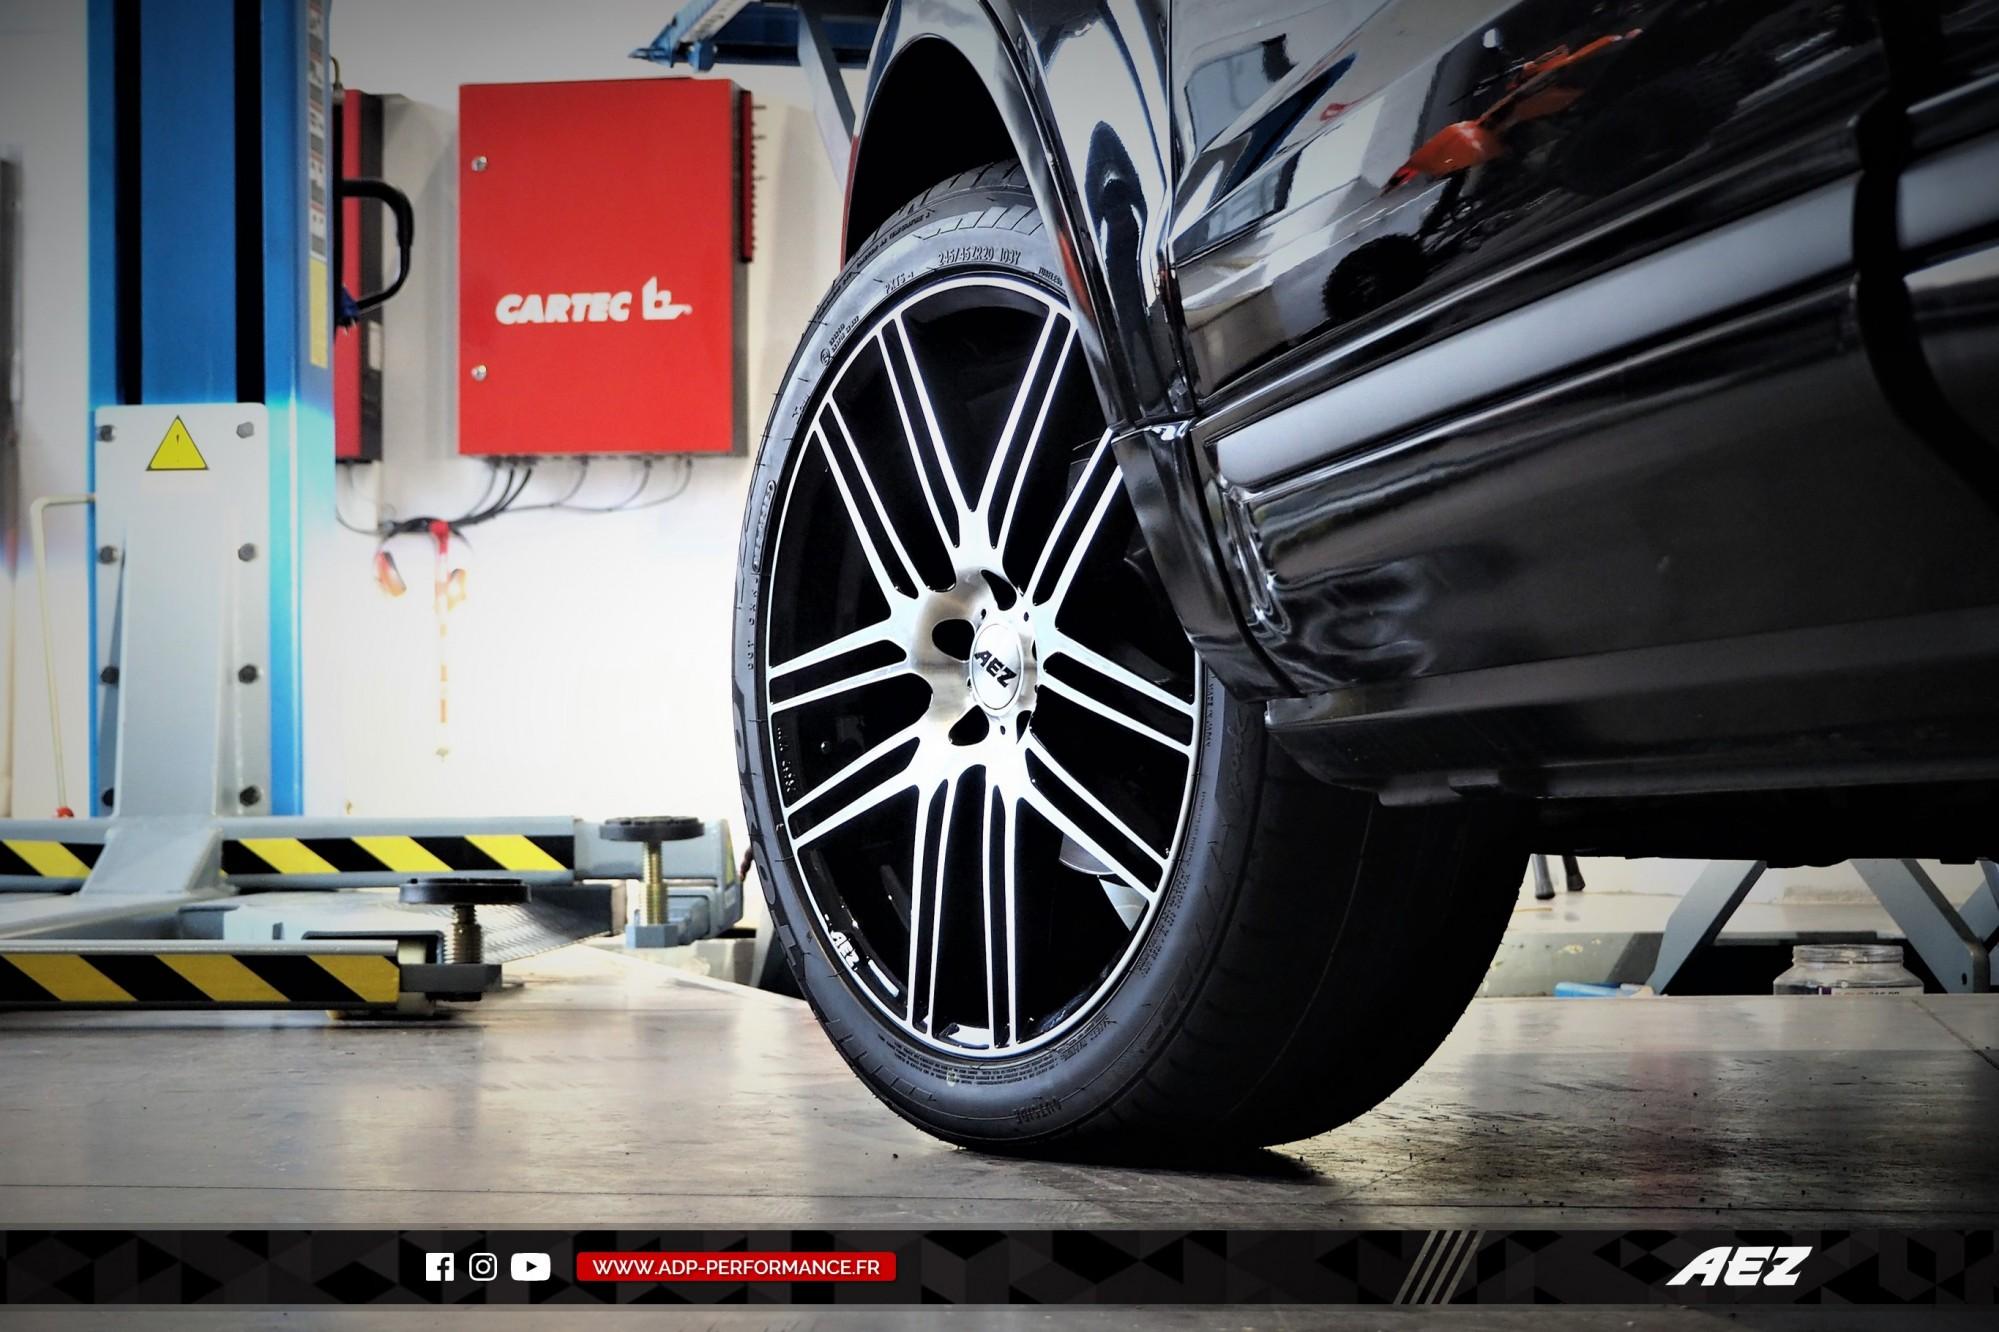 Jantes AEZ Avignon - Land Rover Evoque - ADP Performance